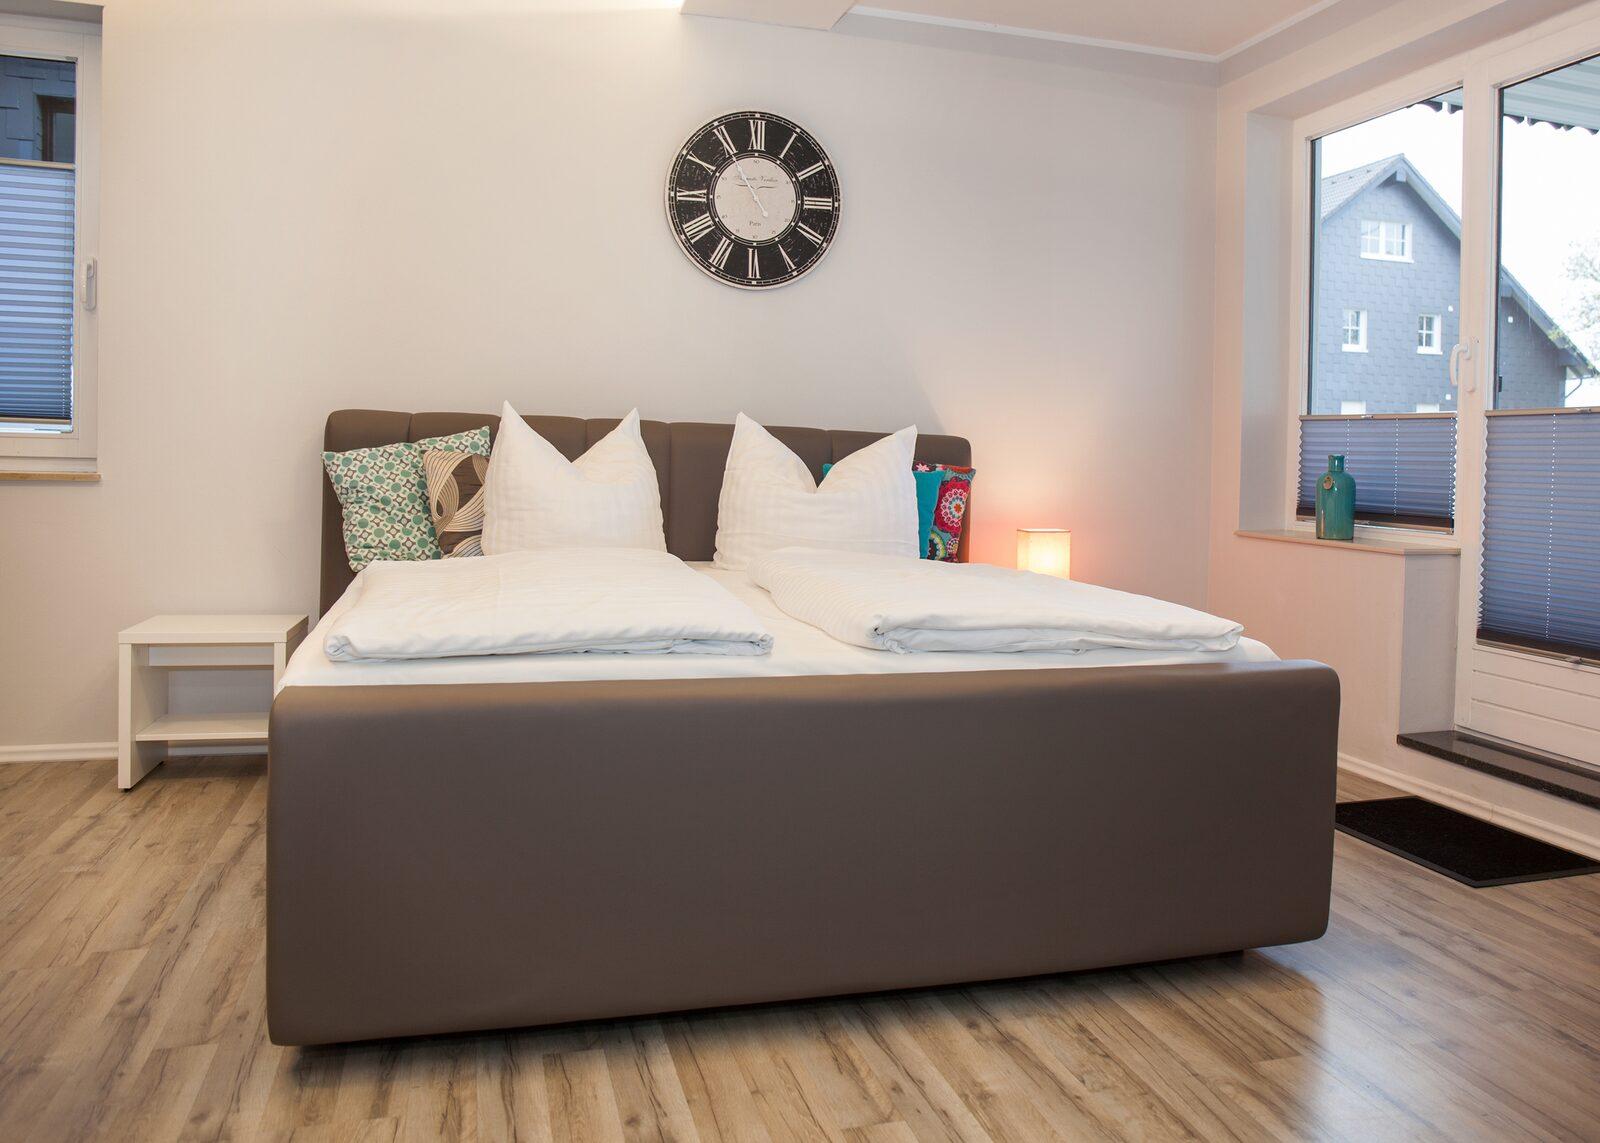 Studio - Komfort 2 Personen (kein Couch)